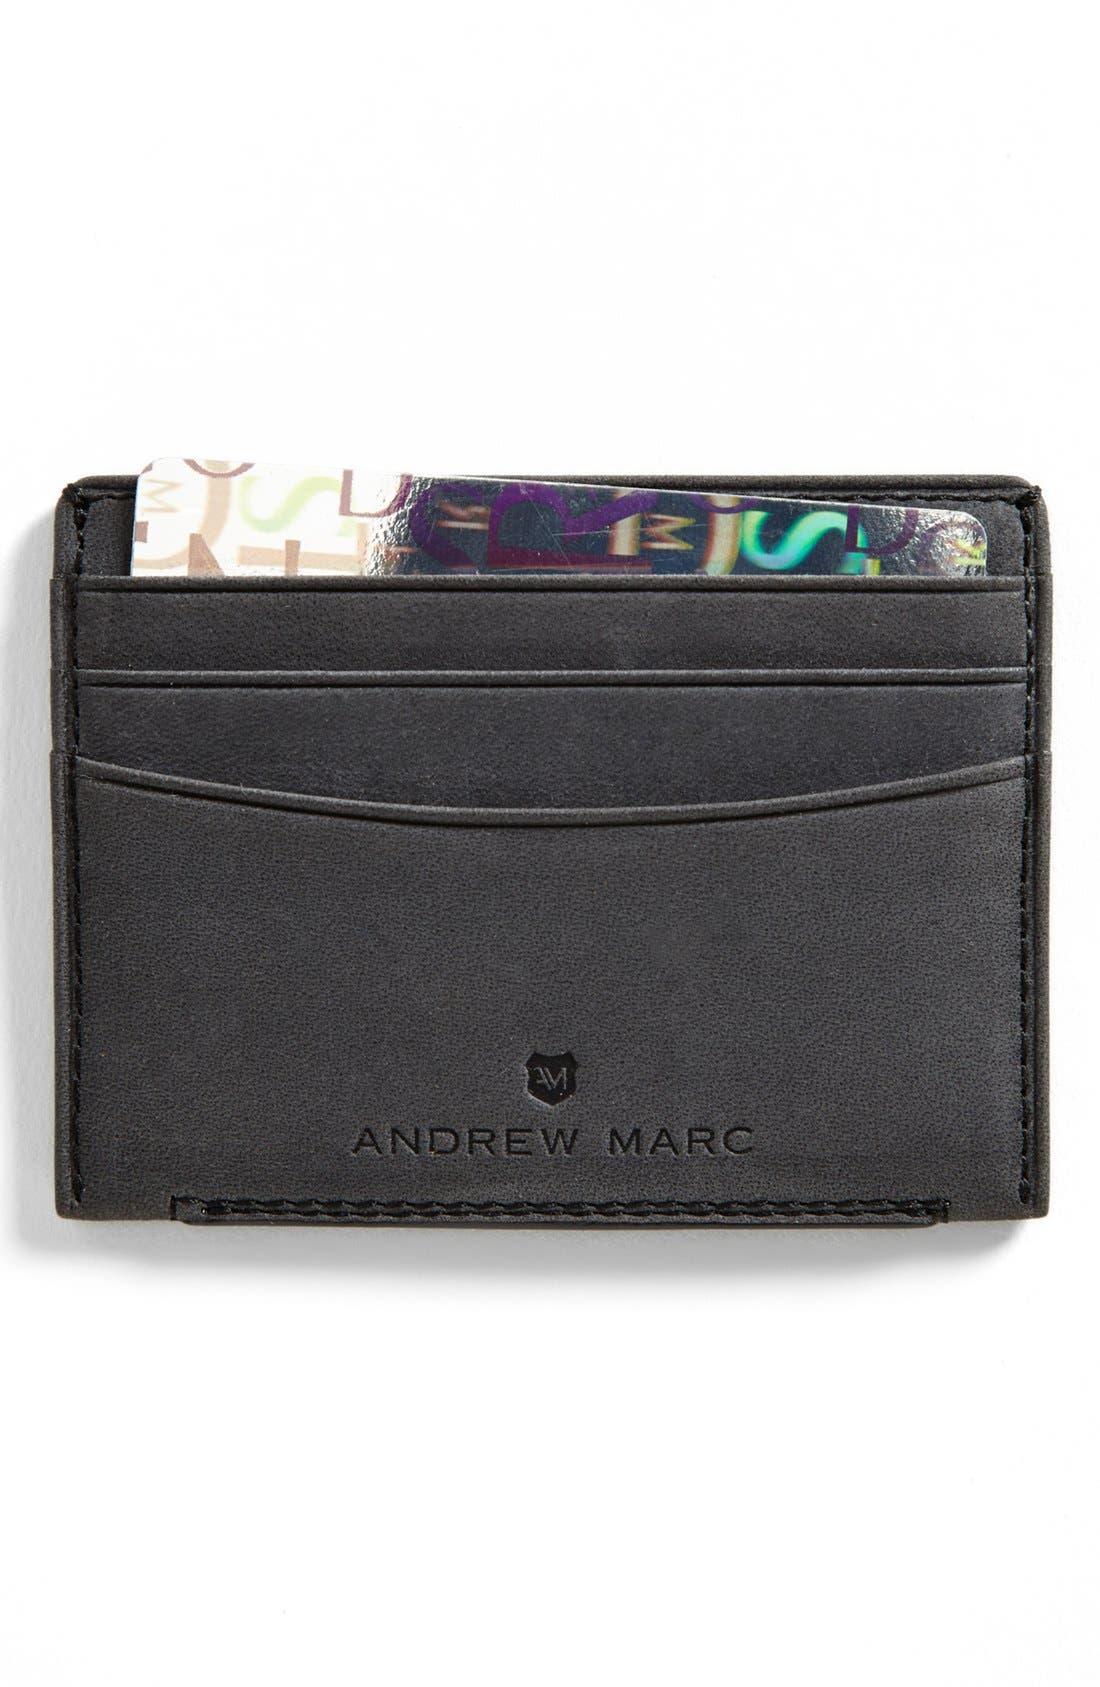 Alternate Image 1 Selected - Andrew Marc 'Warren' Card Case